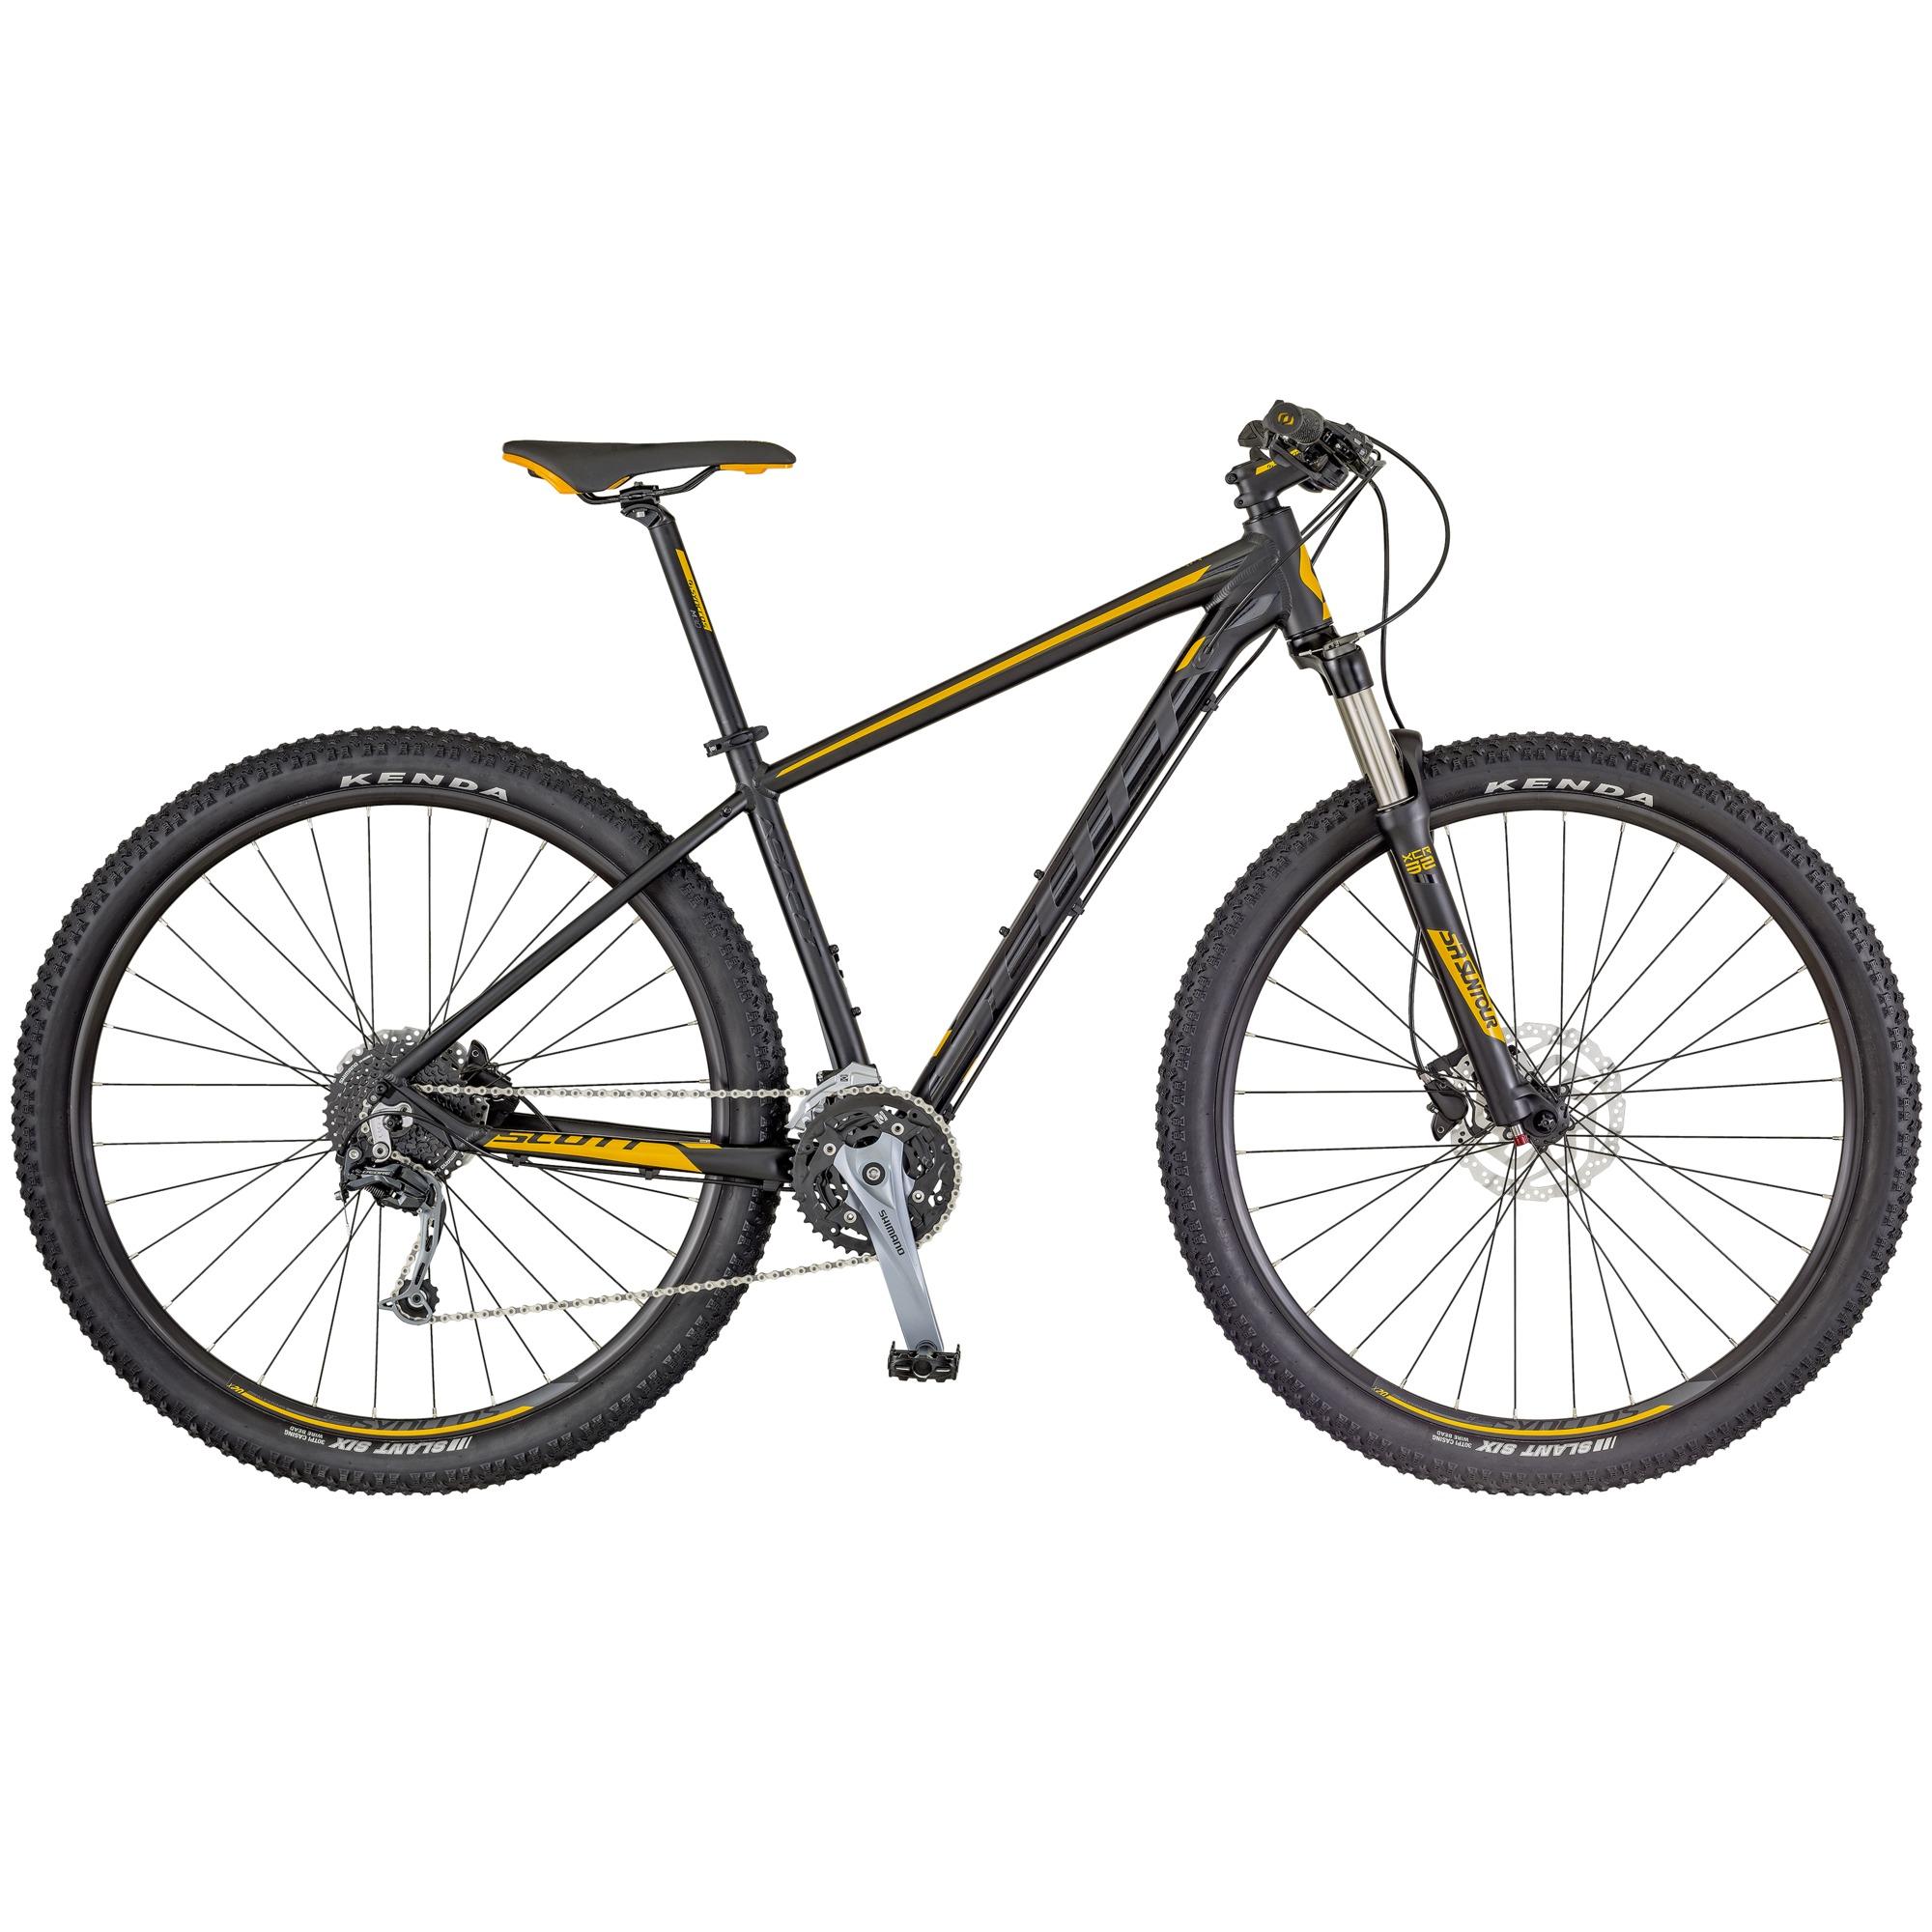 SCOTT Aspect 730 Bike schwarz/gelb L - Zweirad Homann